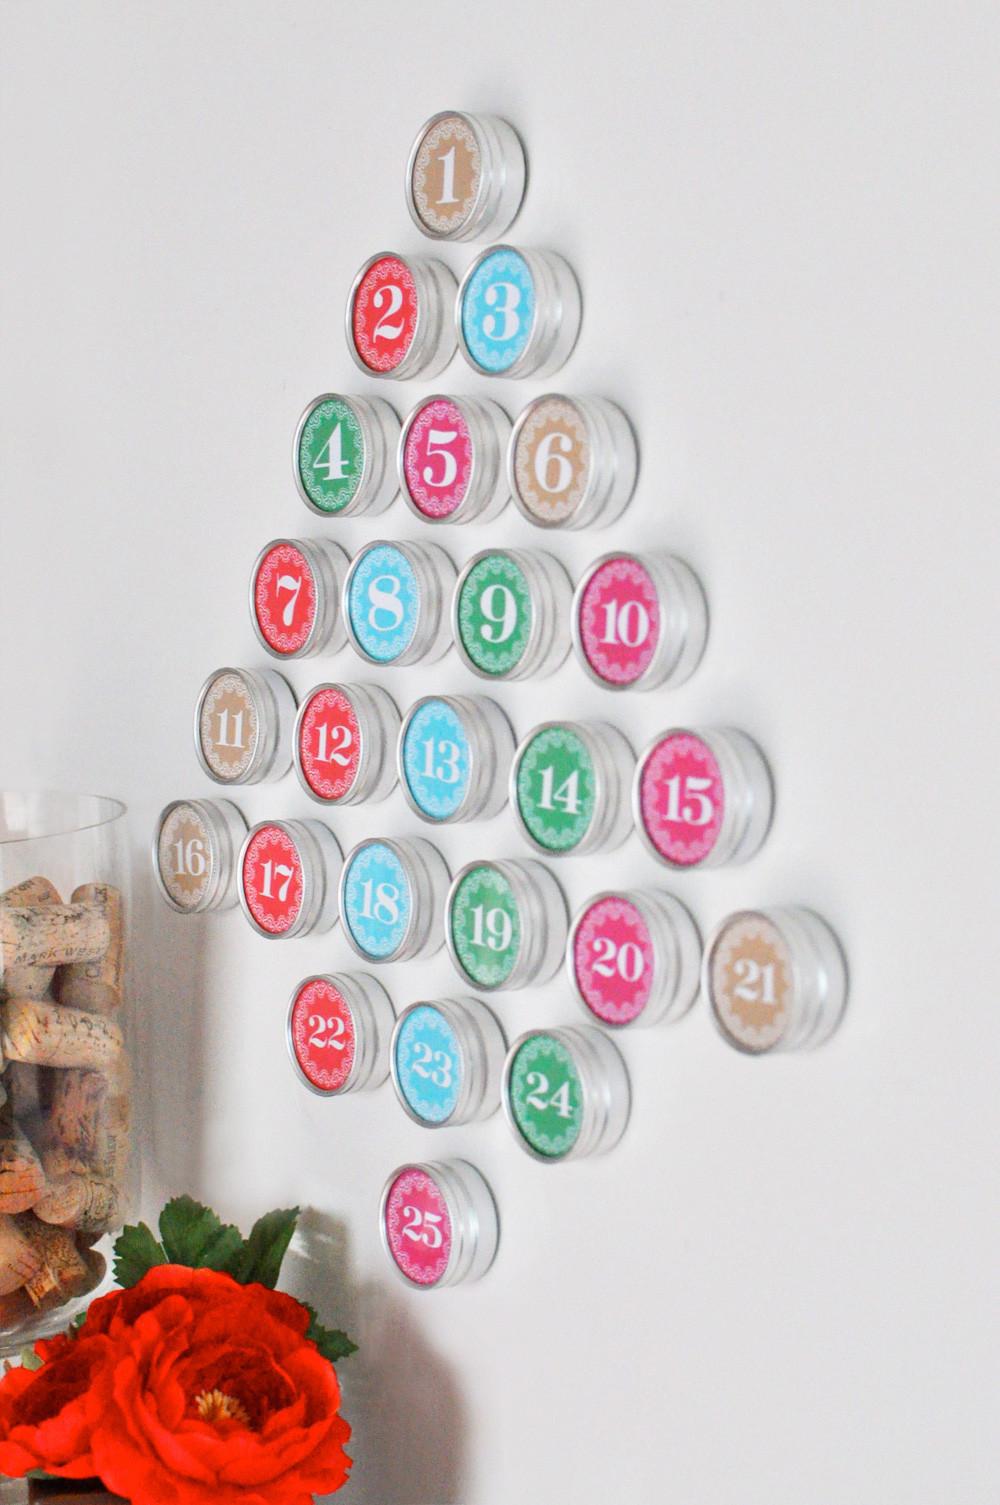 Best ideas about Advent Calendar DIY . Save or Pin Yvonne Byatt s Family Fun CHRISTMAS ADVENT CALENDERS Now.